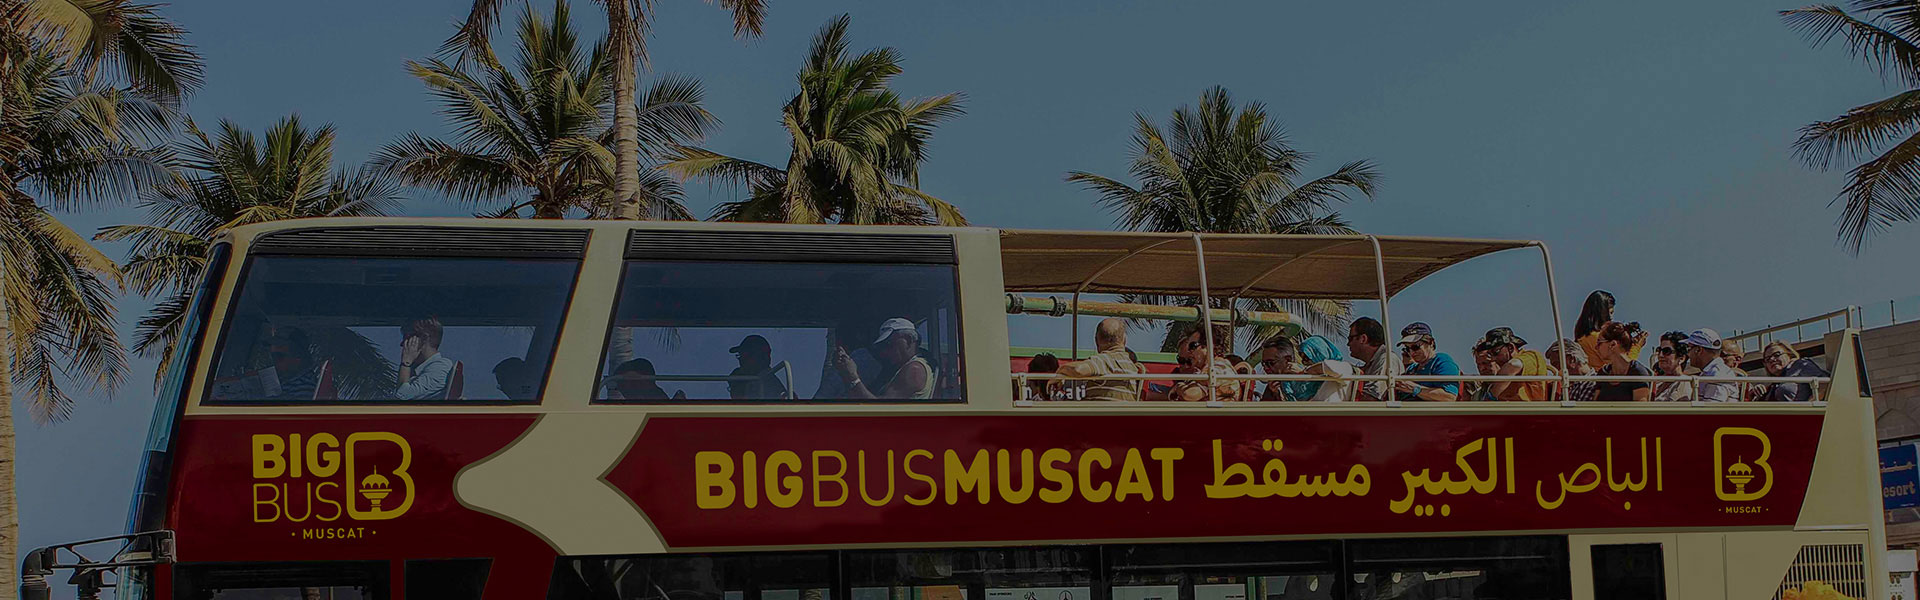 Tourists on Muscat Big Bus